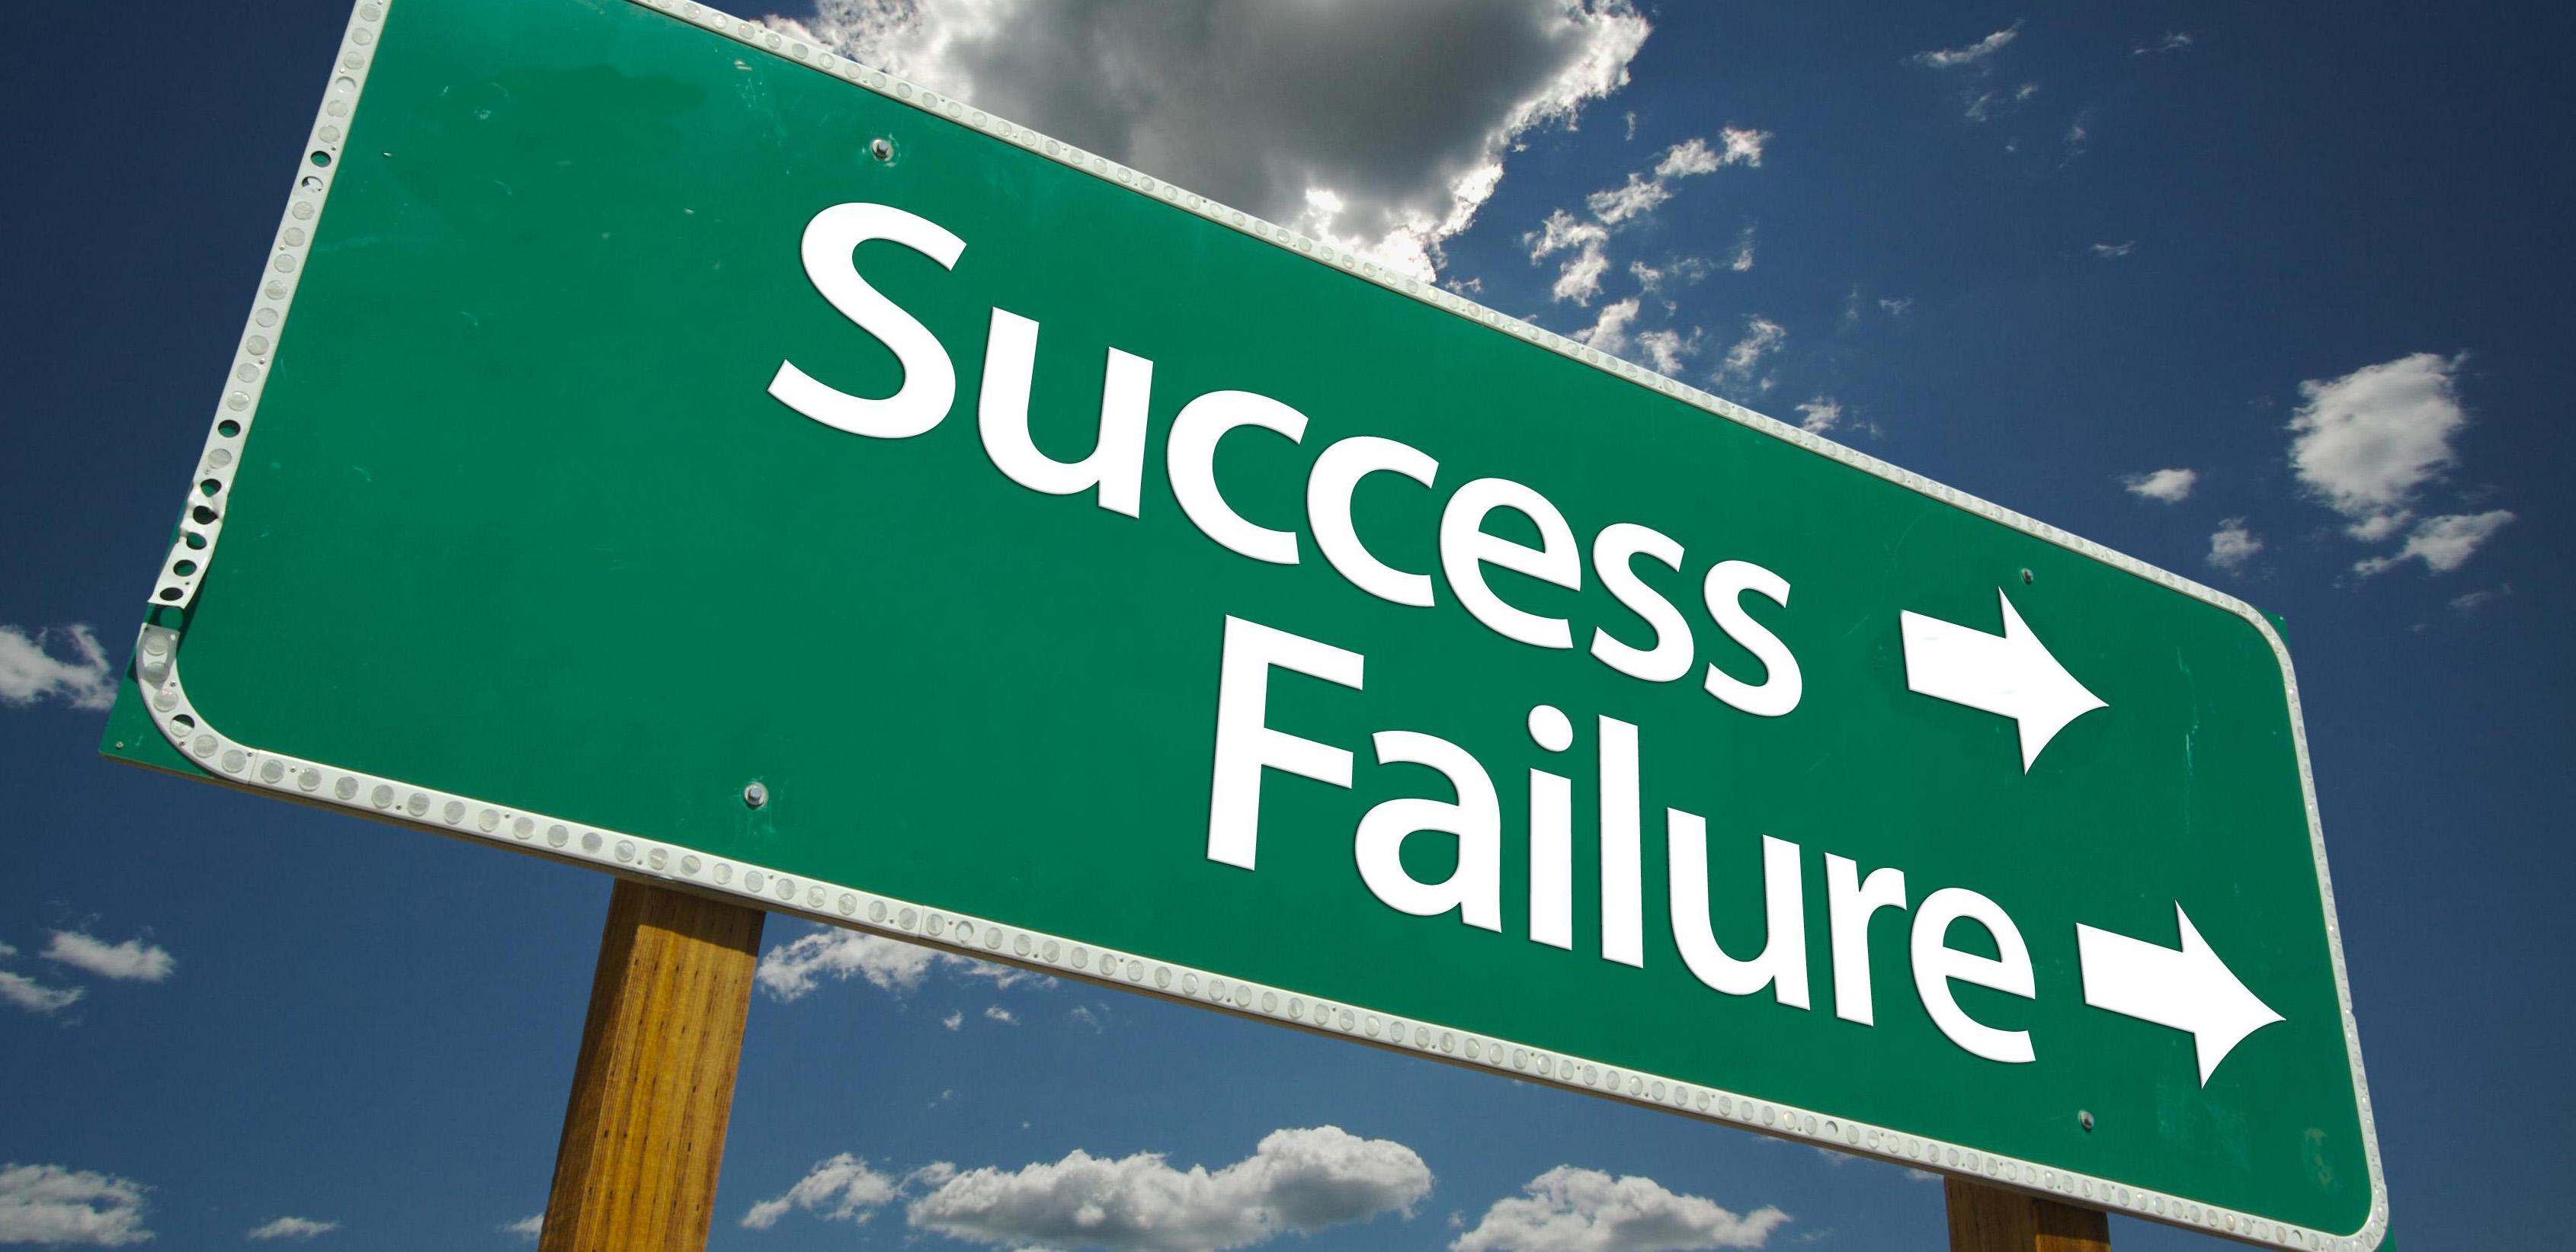 success_failure_direct.jpg